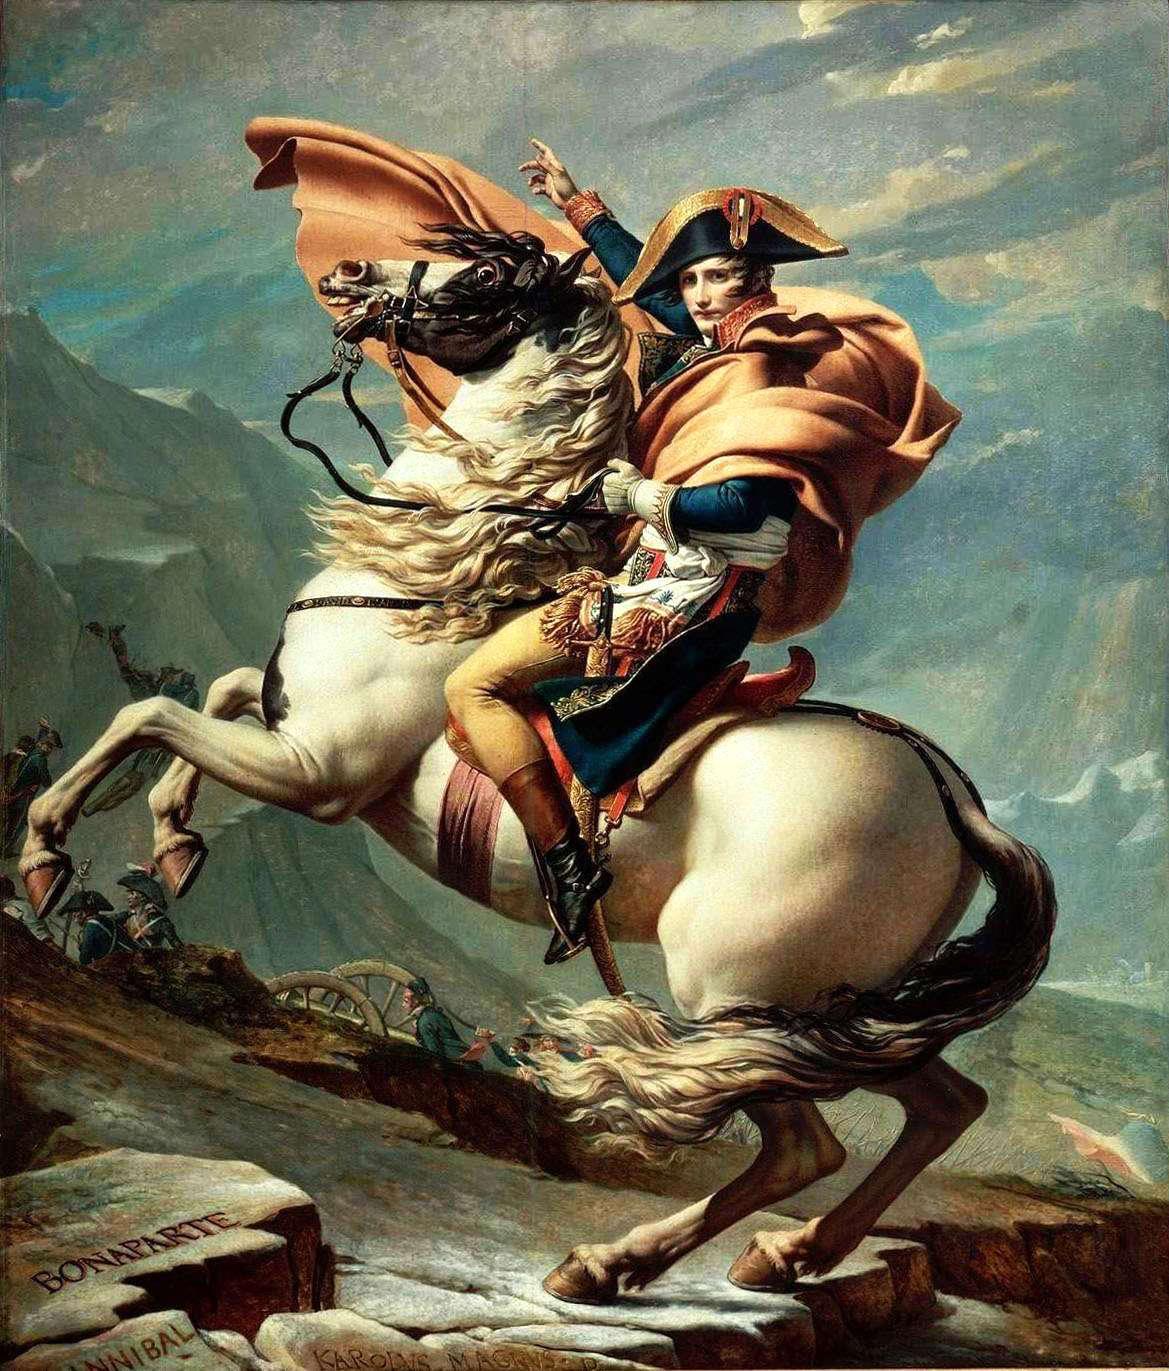 Жак-Луи Давид. Наполеон на перевале Сен-Бернар. 1800. Масло, холст. 261х220 см. Мальмезон, Париж. Источник https://upload.wikimedia.org/